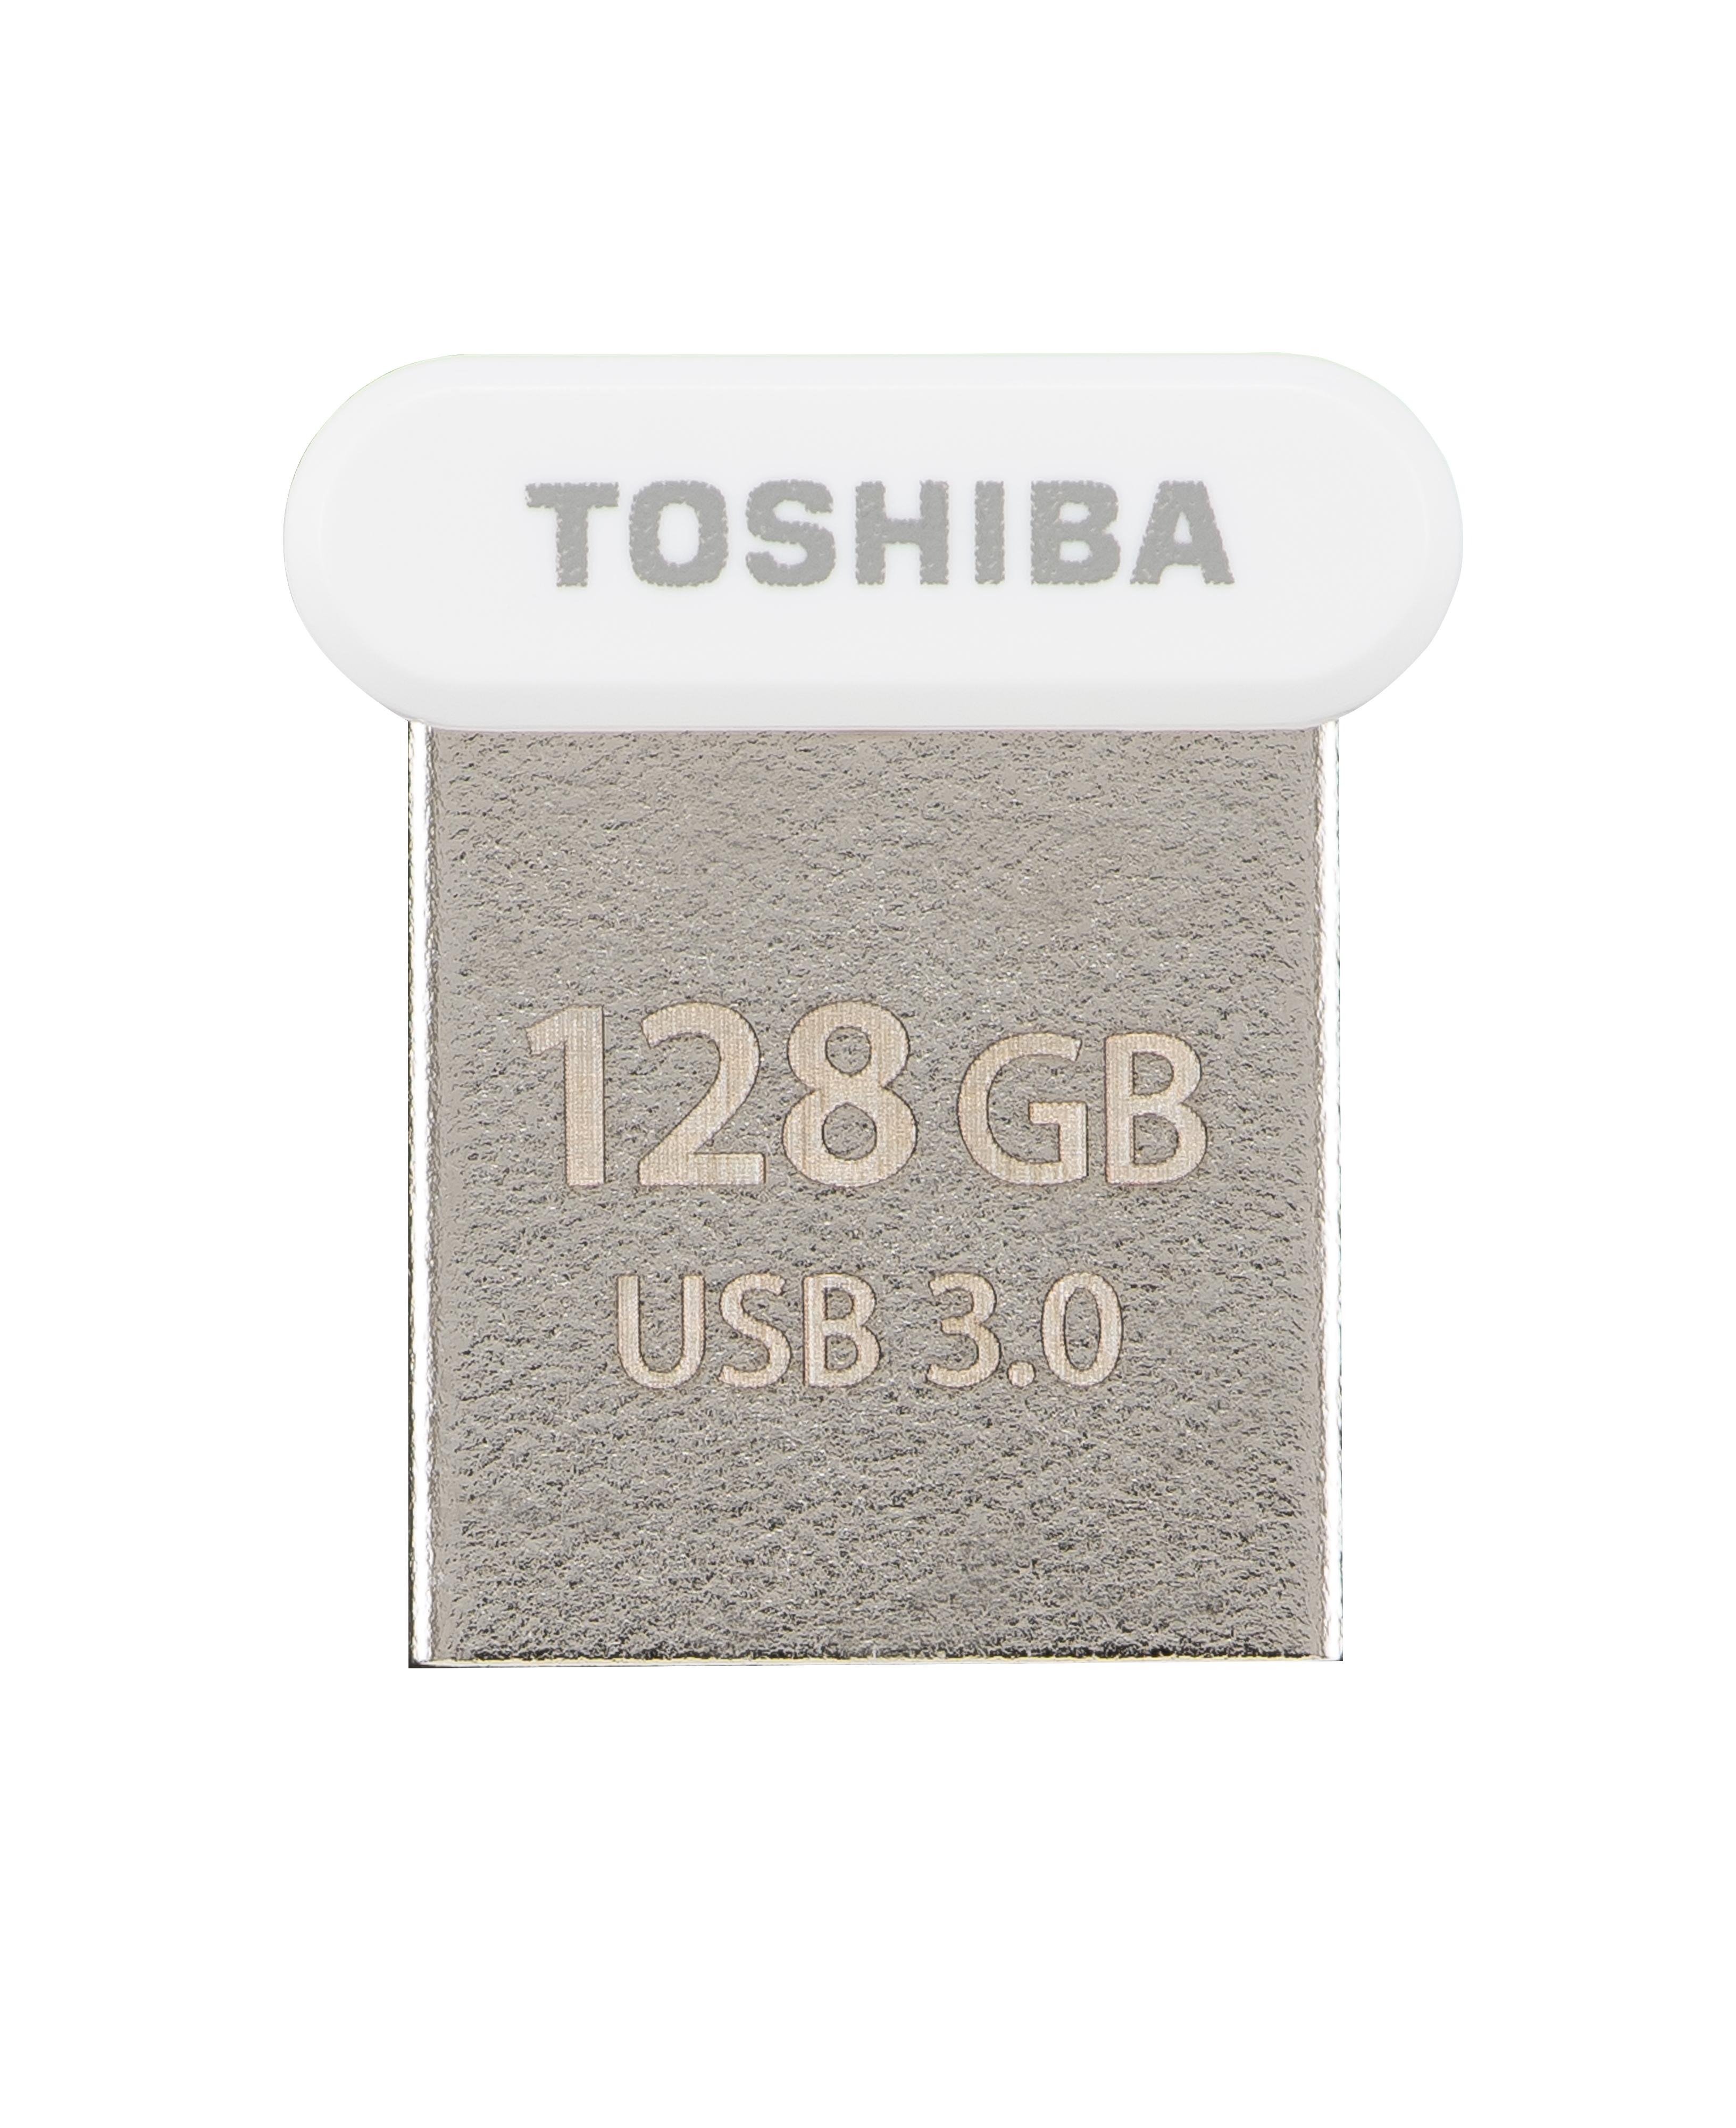 Toshiba - Thn-u364w1280e4